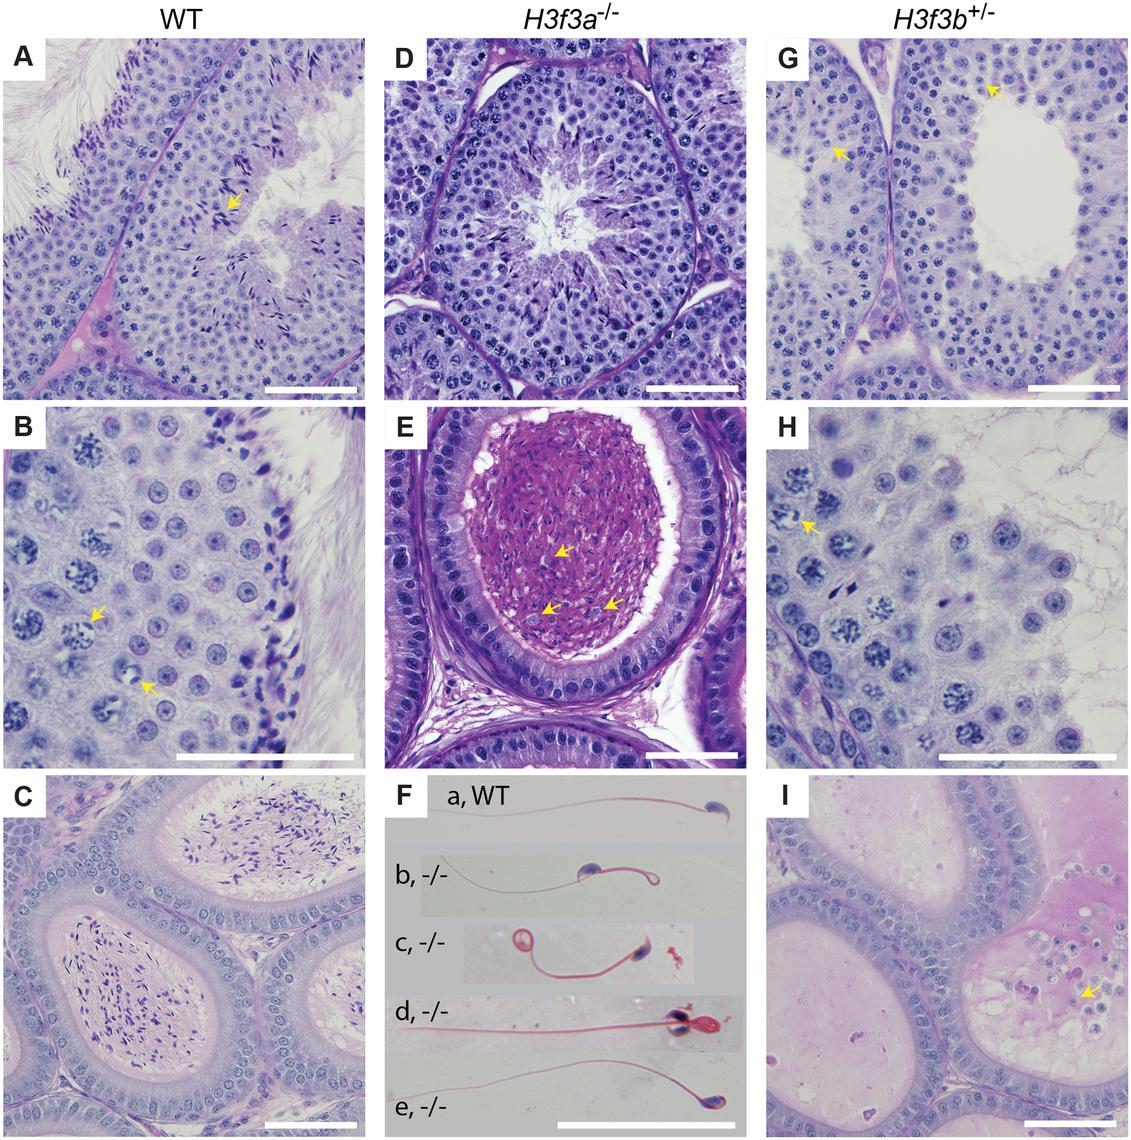 Testis and sperm morphology.